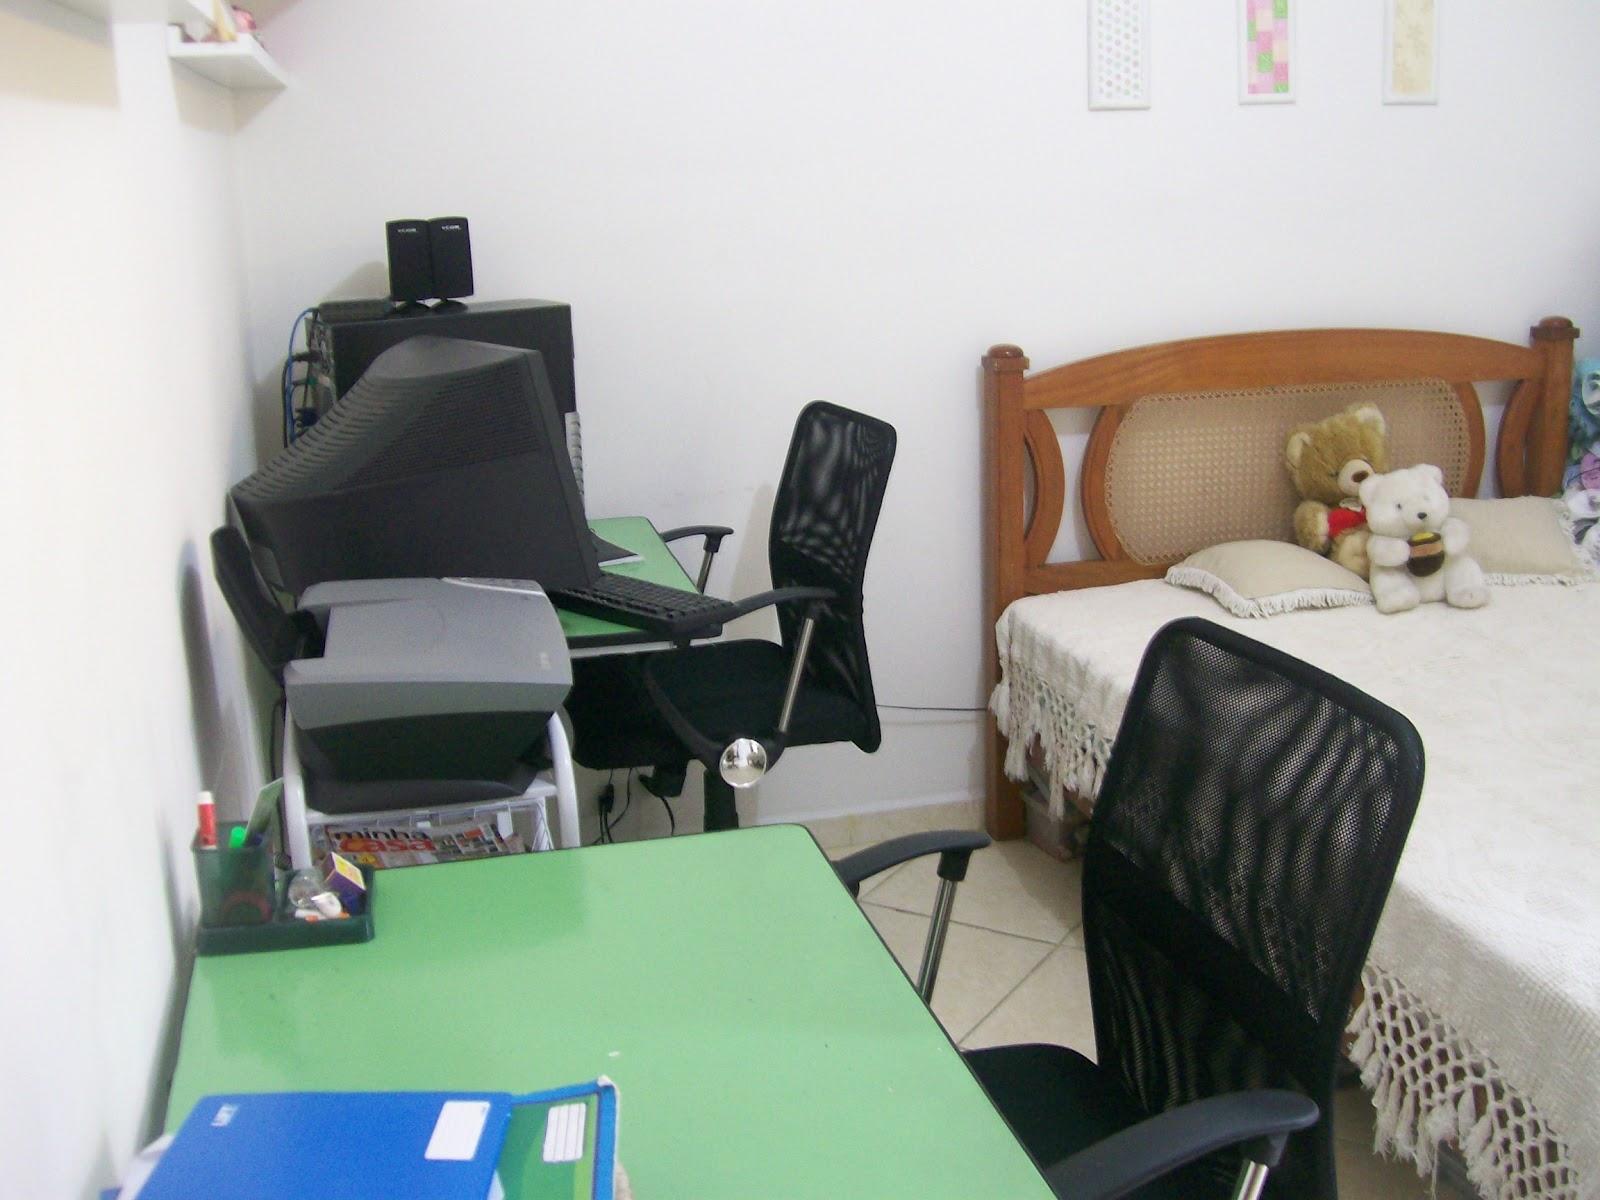 Casa da calli cama que vira sof for Sofa que vira beliche